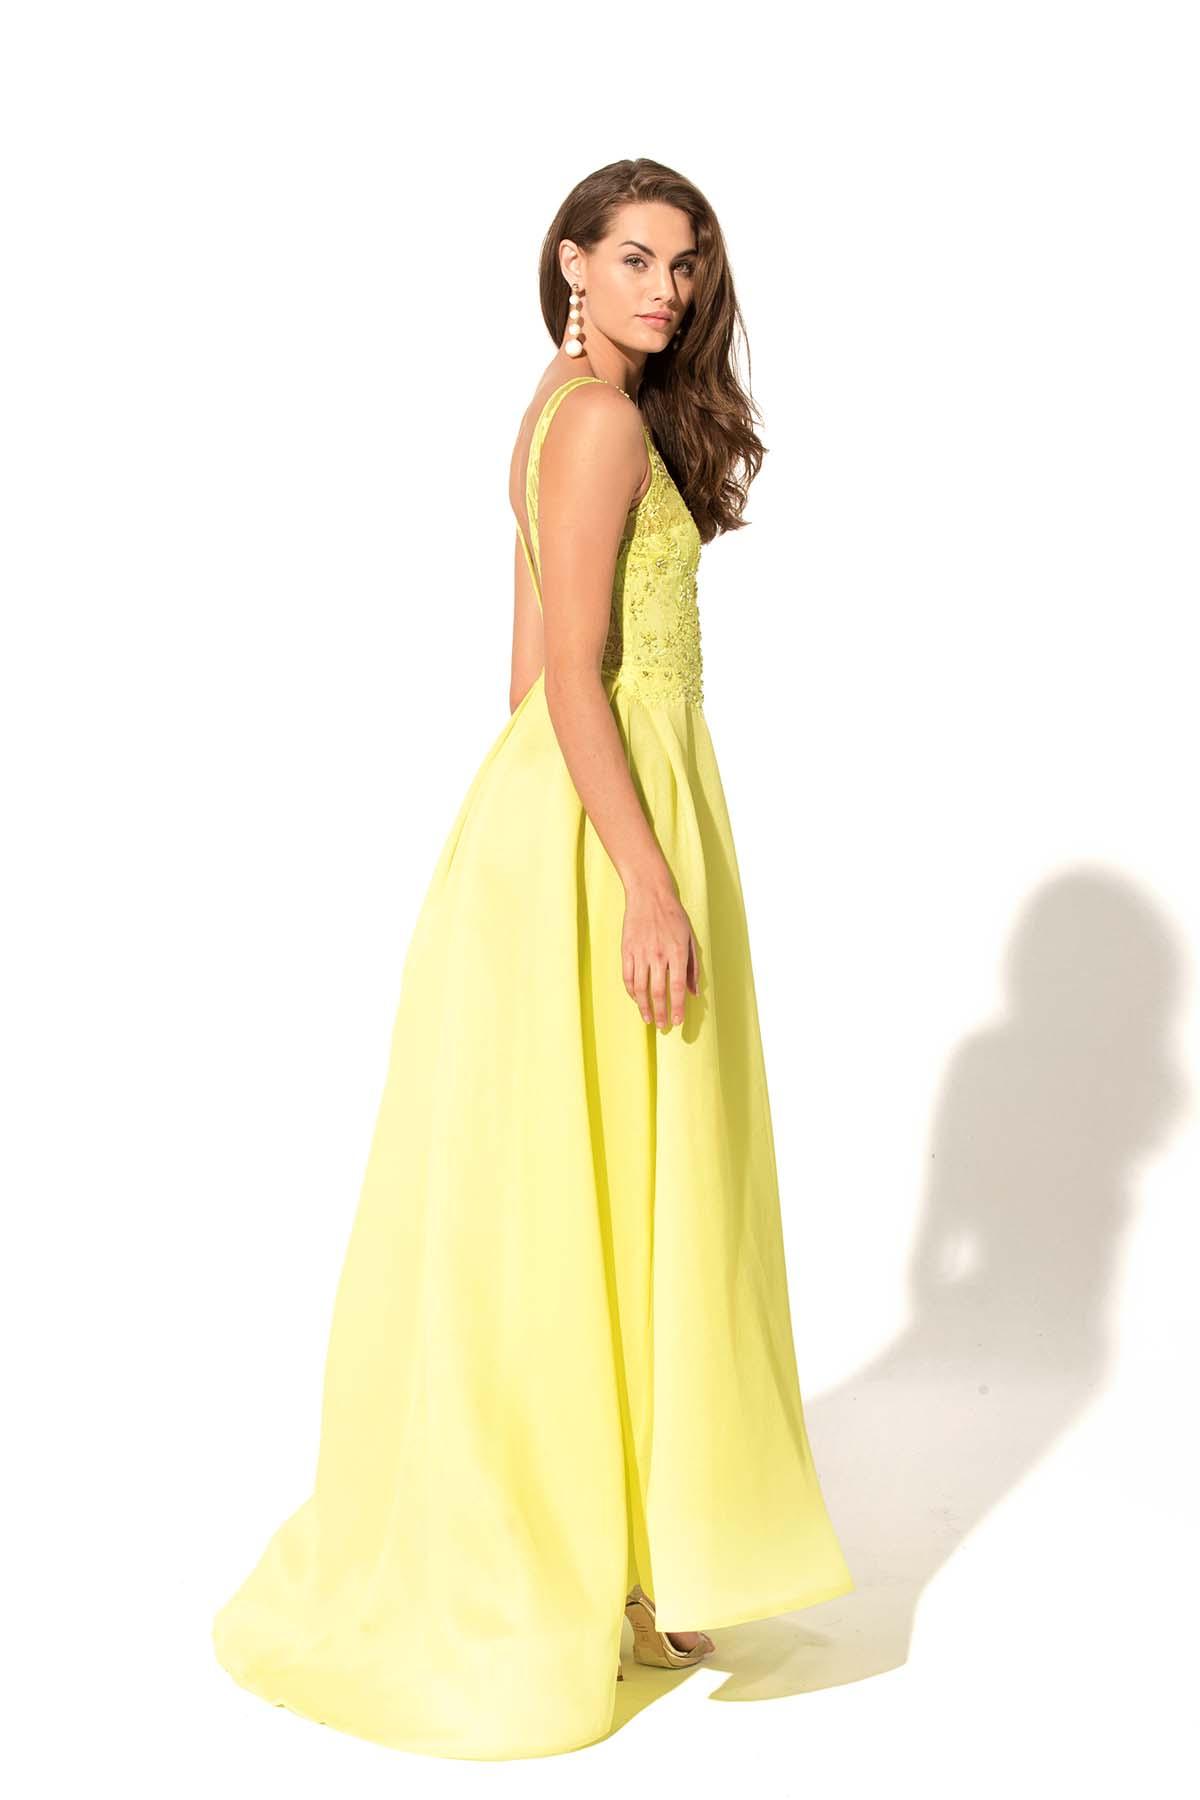 Teria Yabar - Vestido Madeleine amarillo